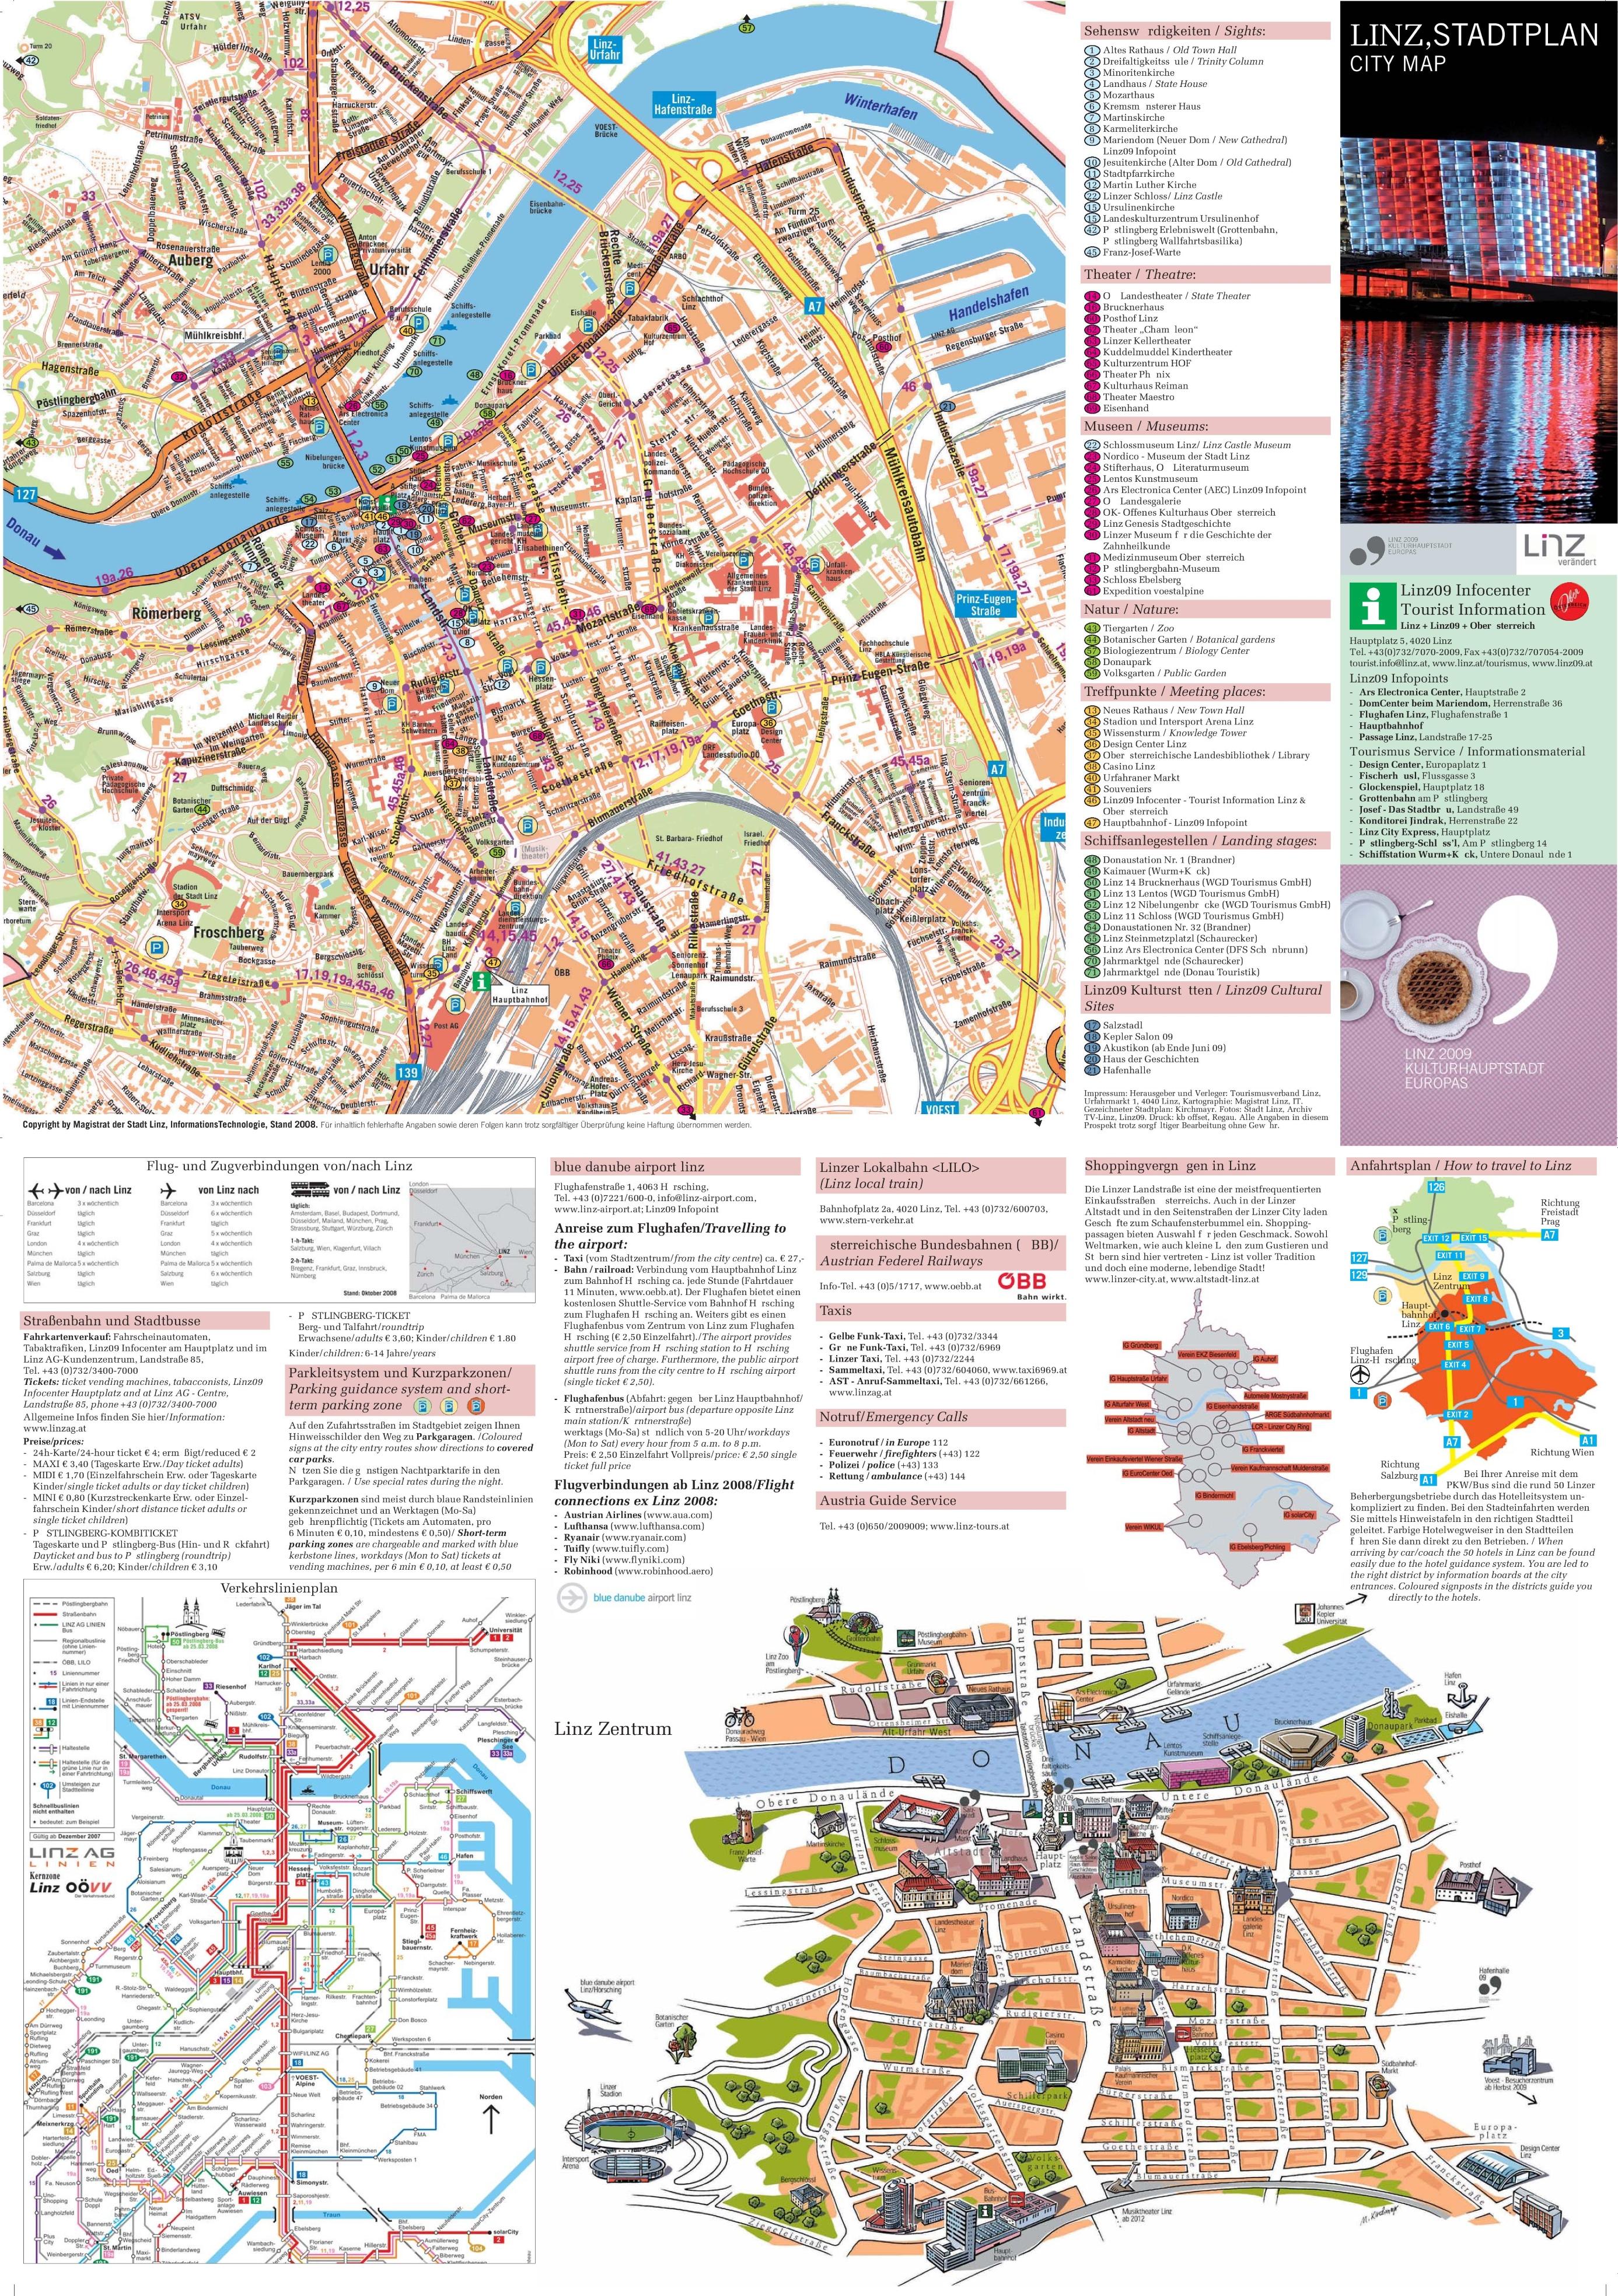 Linz Austria Map Linz tourist attractions map